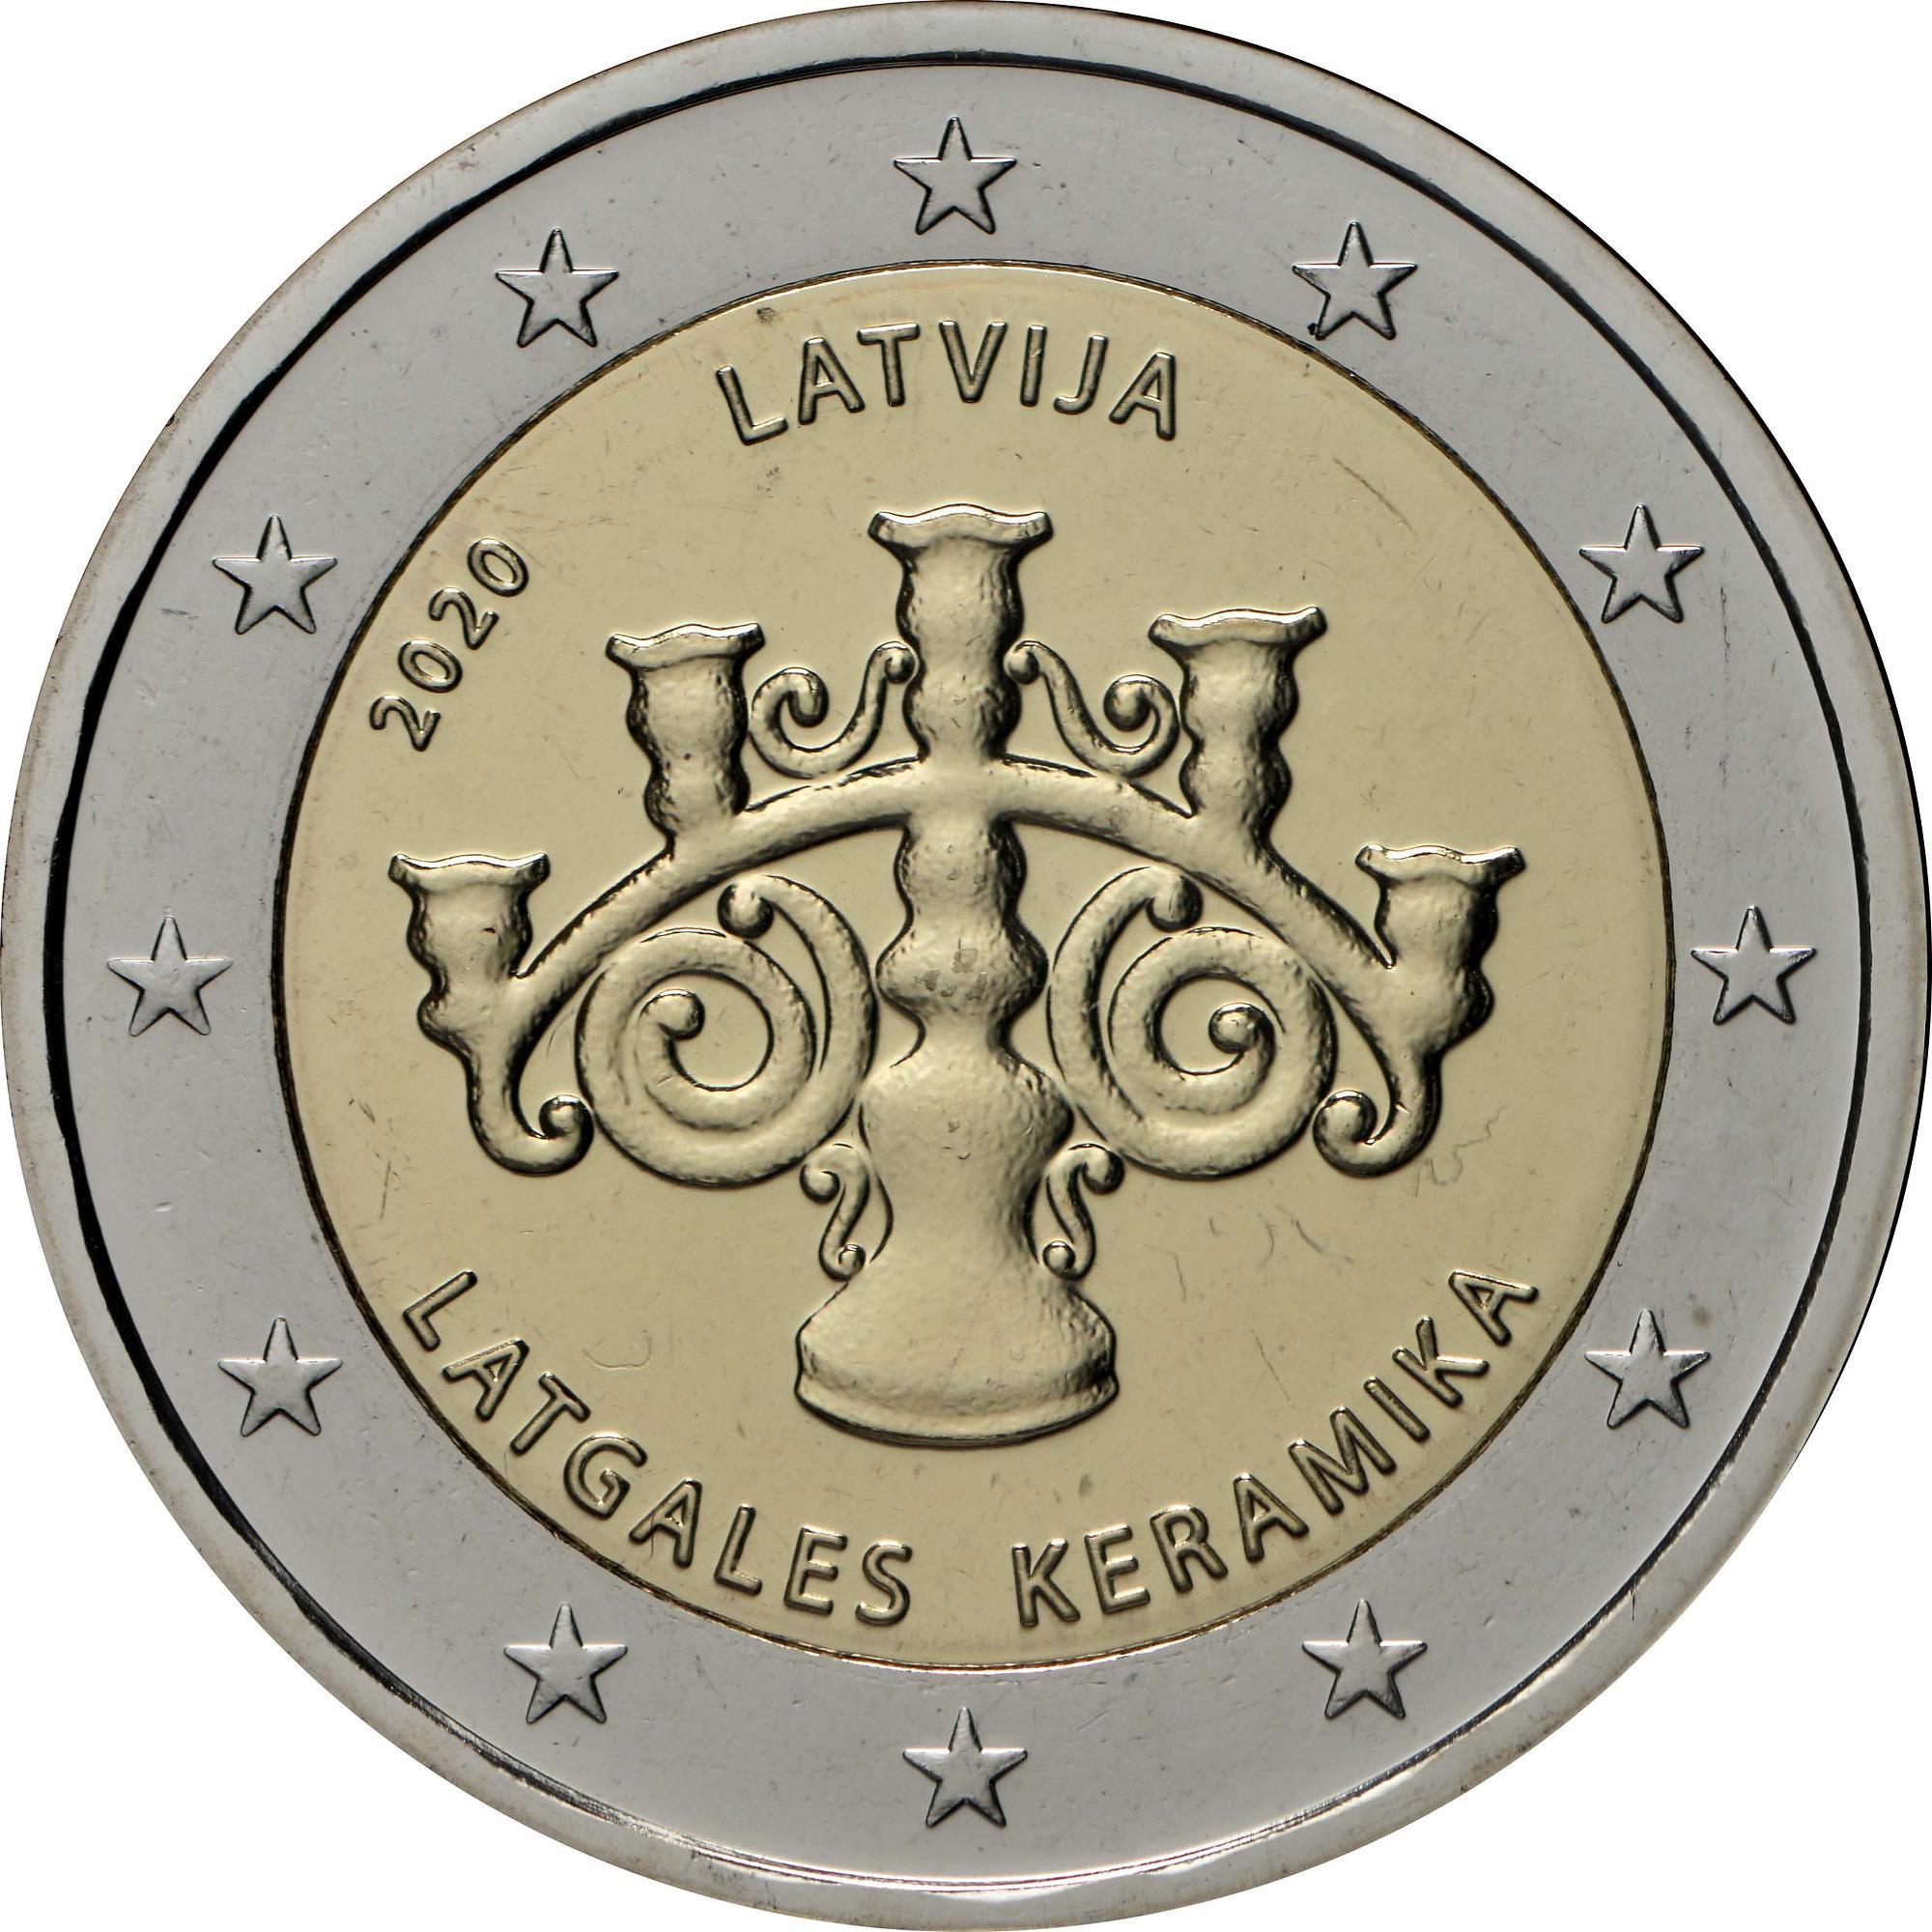 2020 373 Lettland Keramik.jpg